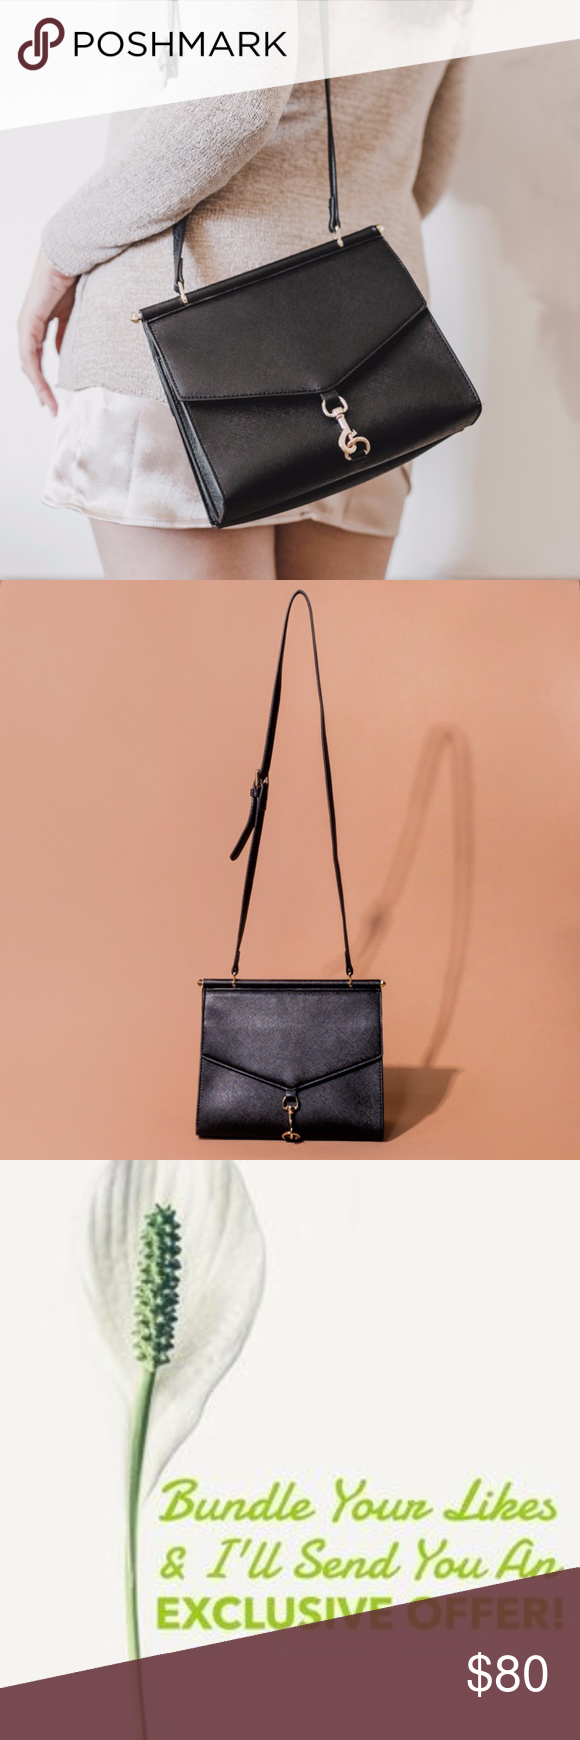 db63cbf0cda2 Lionel Handbags Black Brittany Crossbody Structured